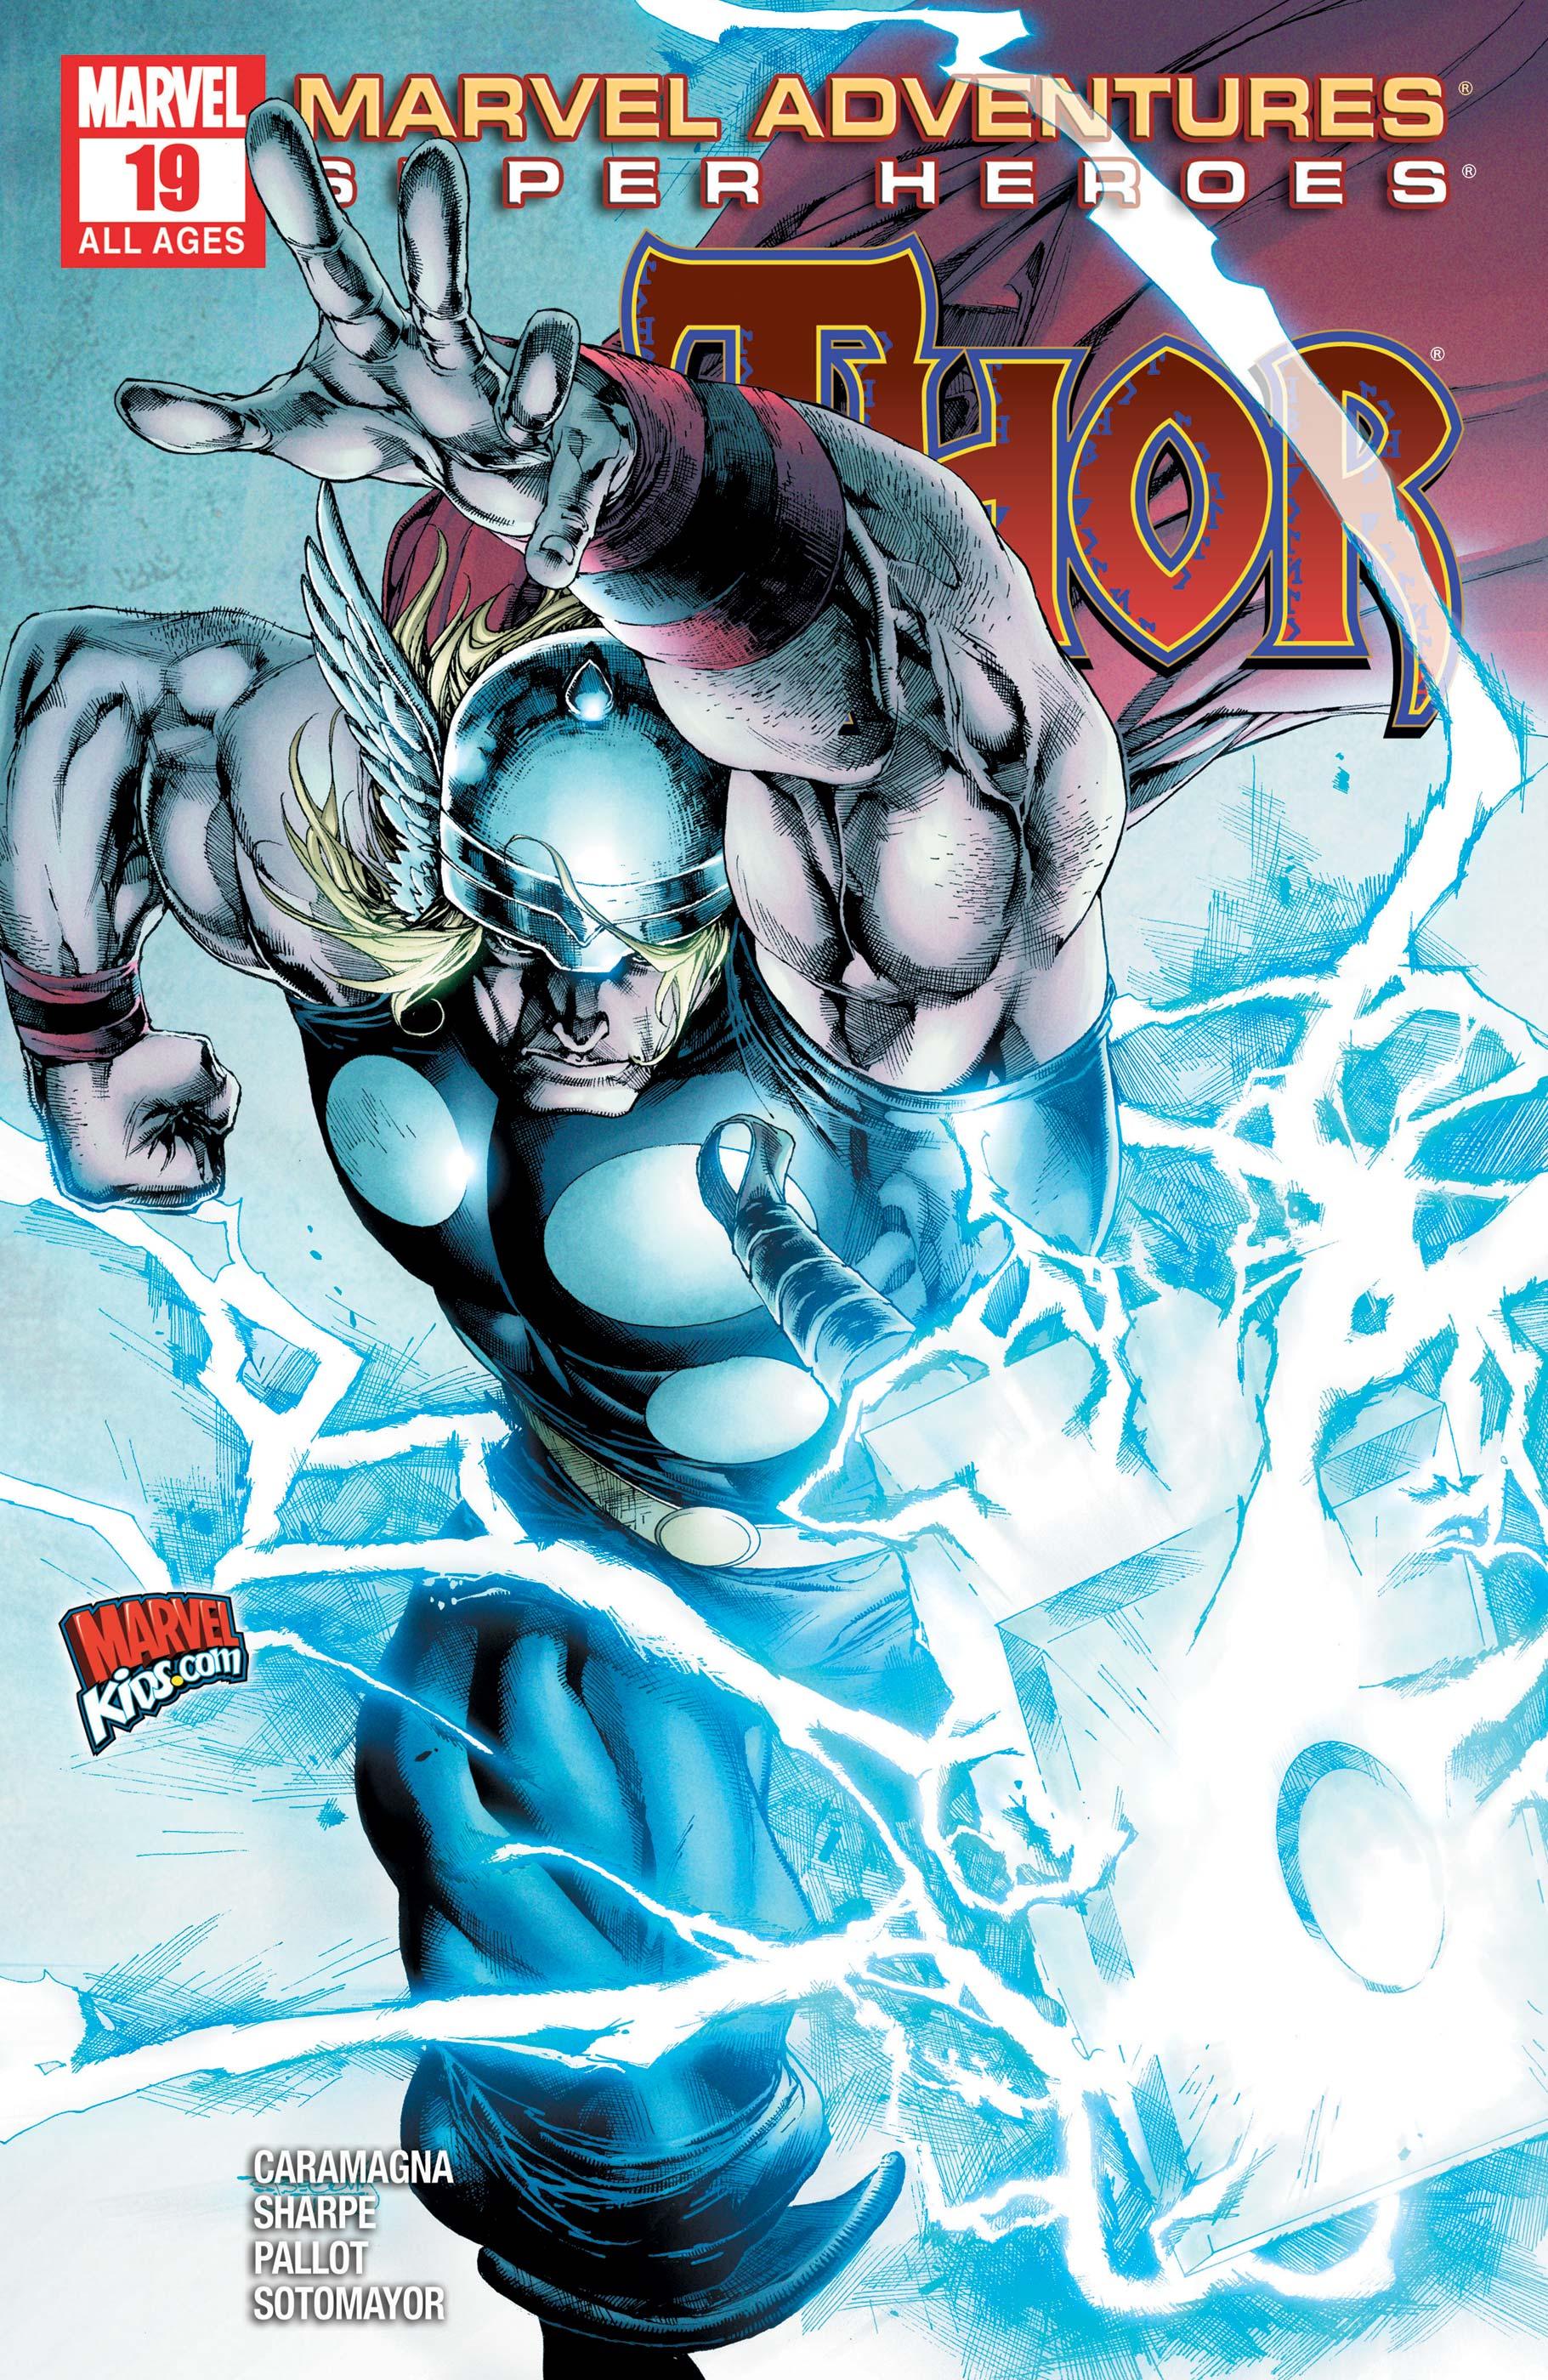 Marvel Adventures Super Heroes (2010) #19